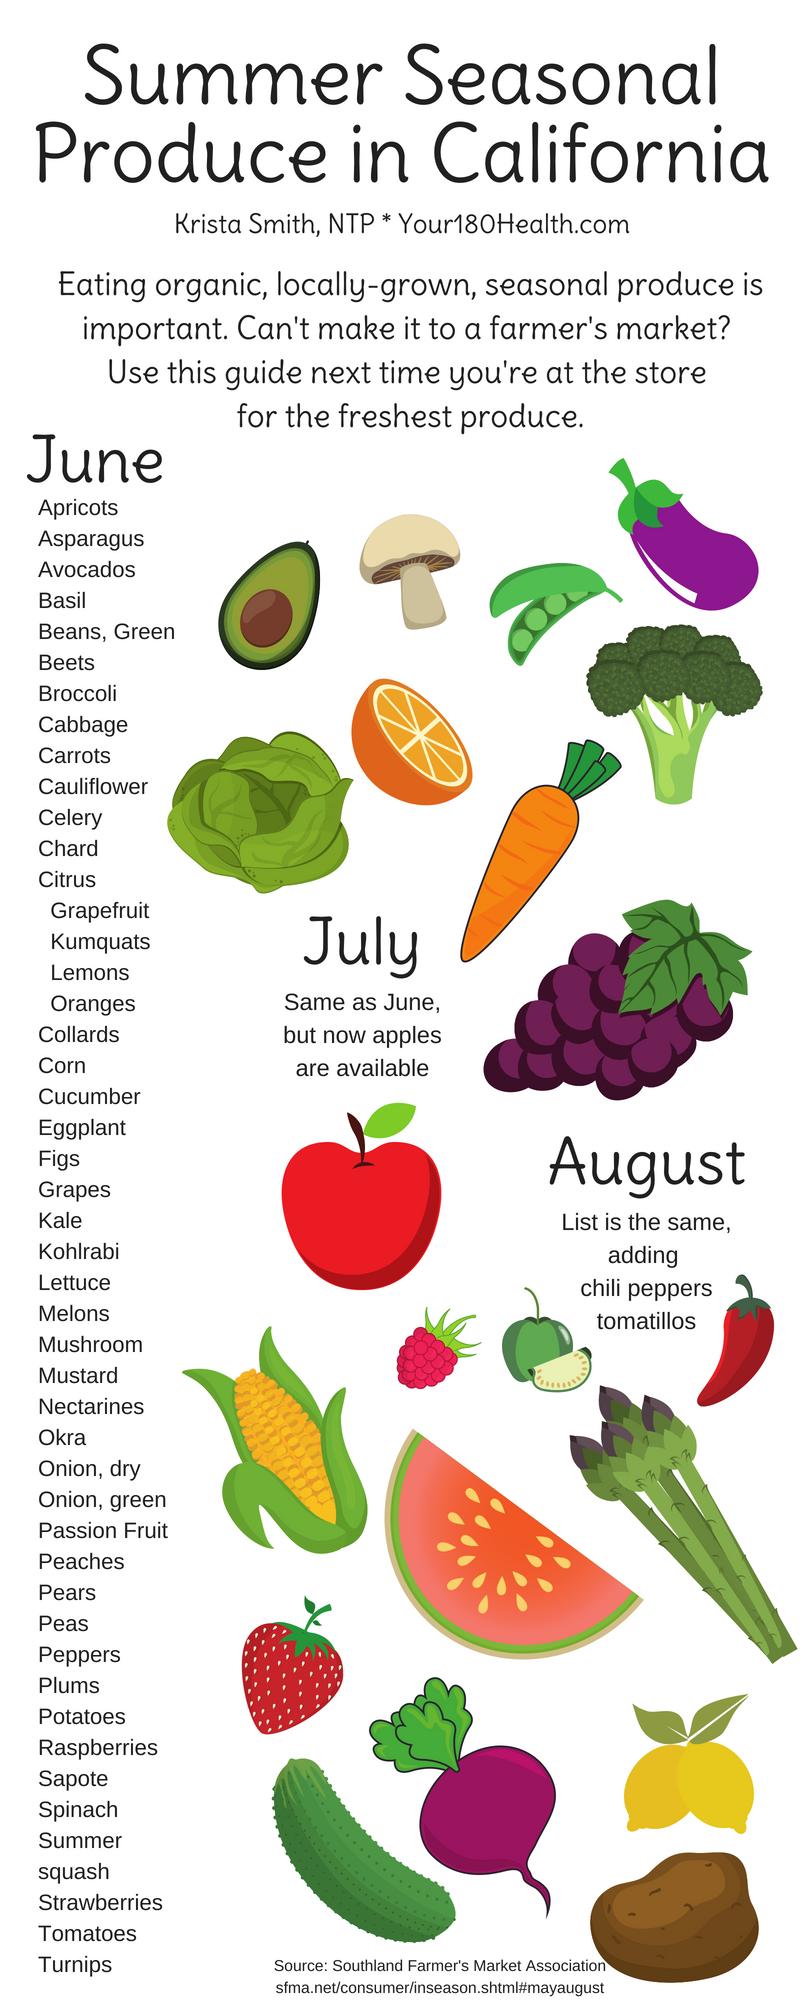 summer seasonal produce guide california farmers market healthy vegetables fruits organic locally grown nutritious